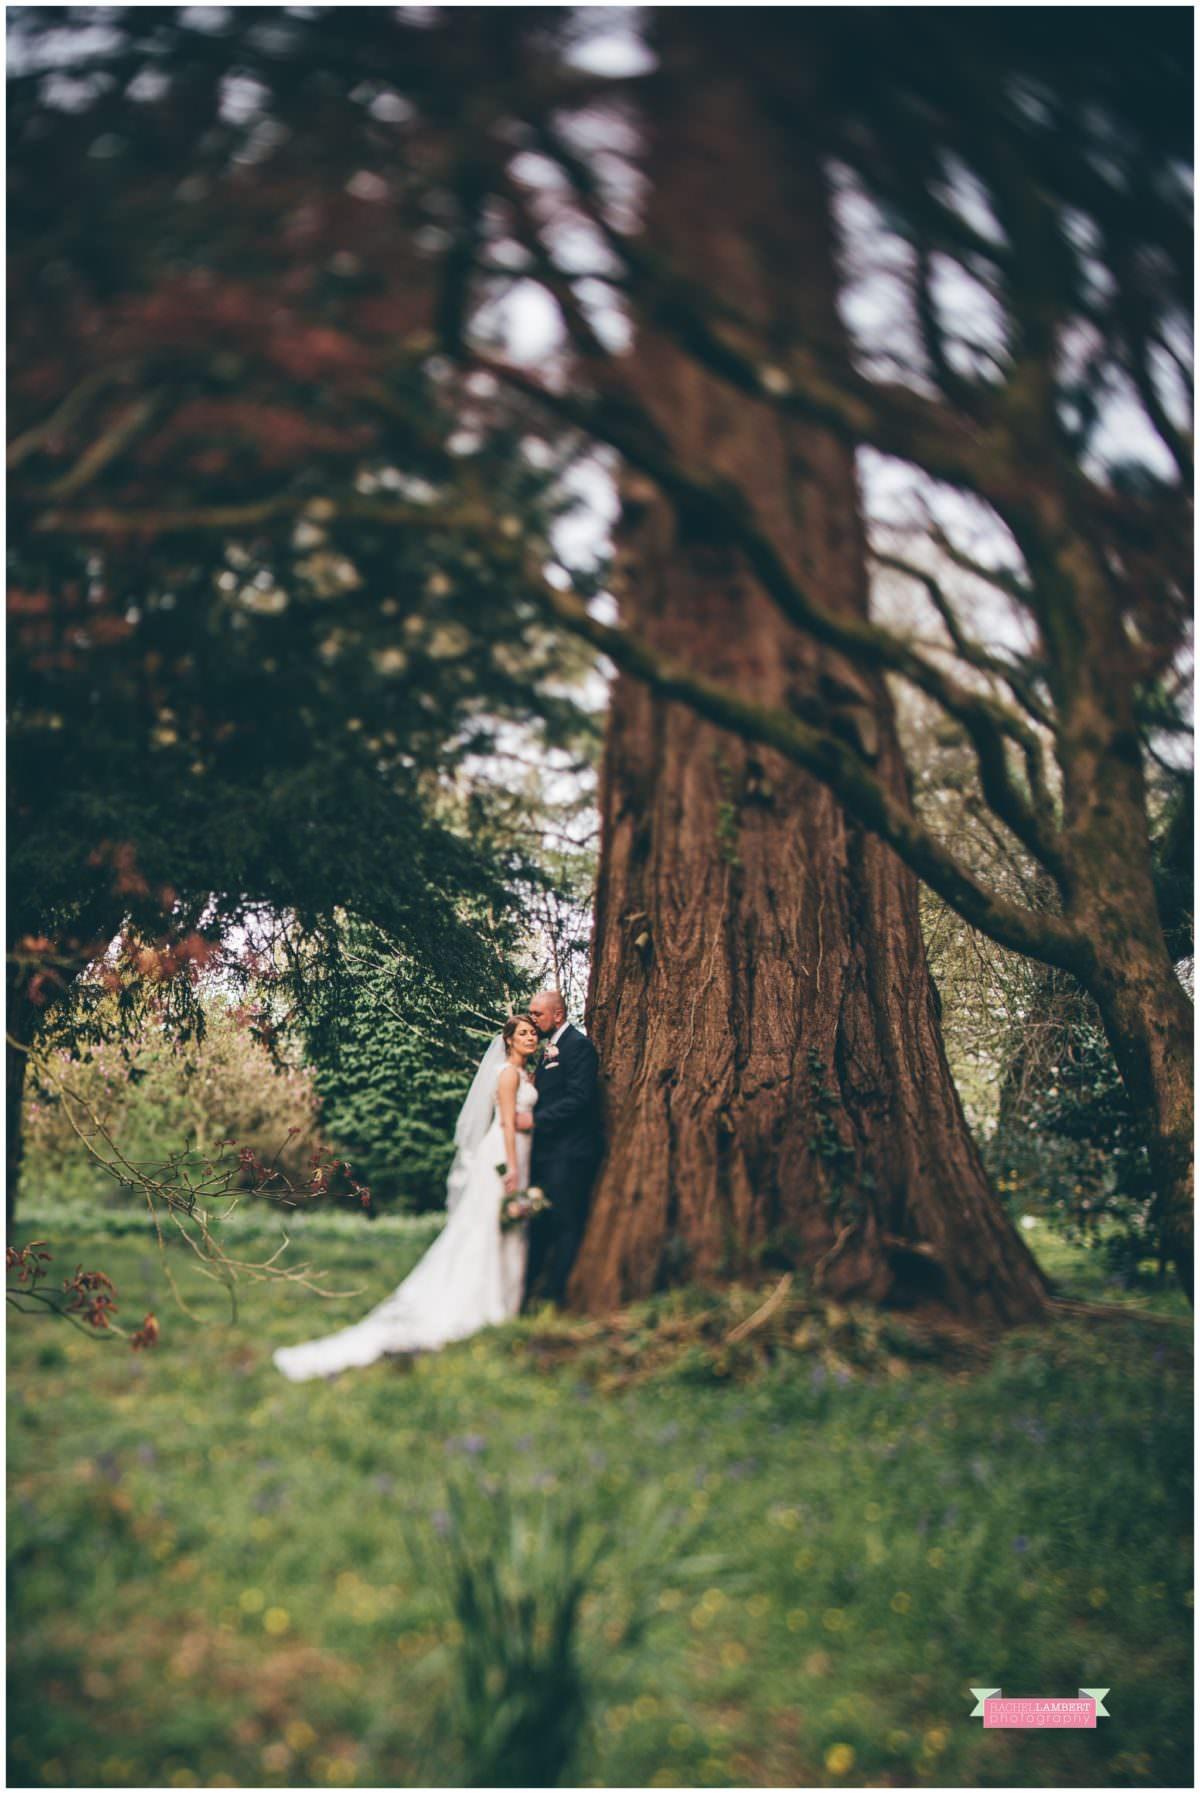 cardiff wedding photographer miskin manor rachel lambert photography bride and groom couple shots